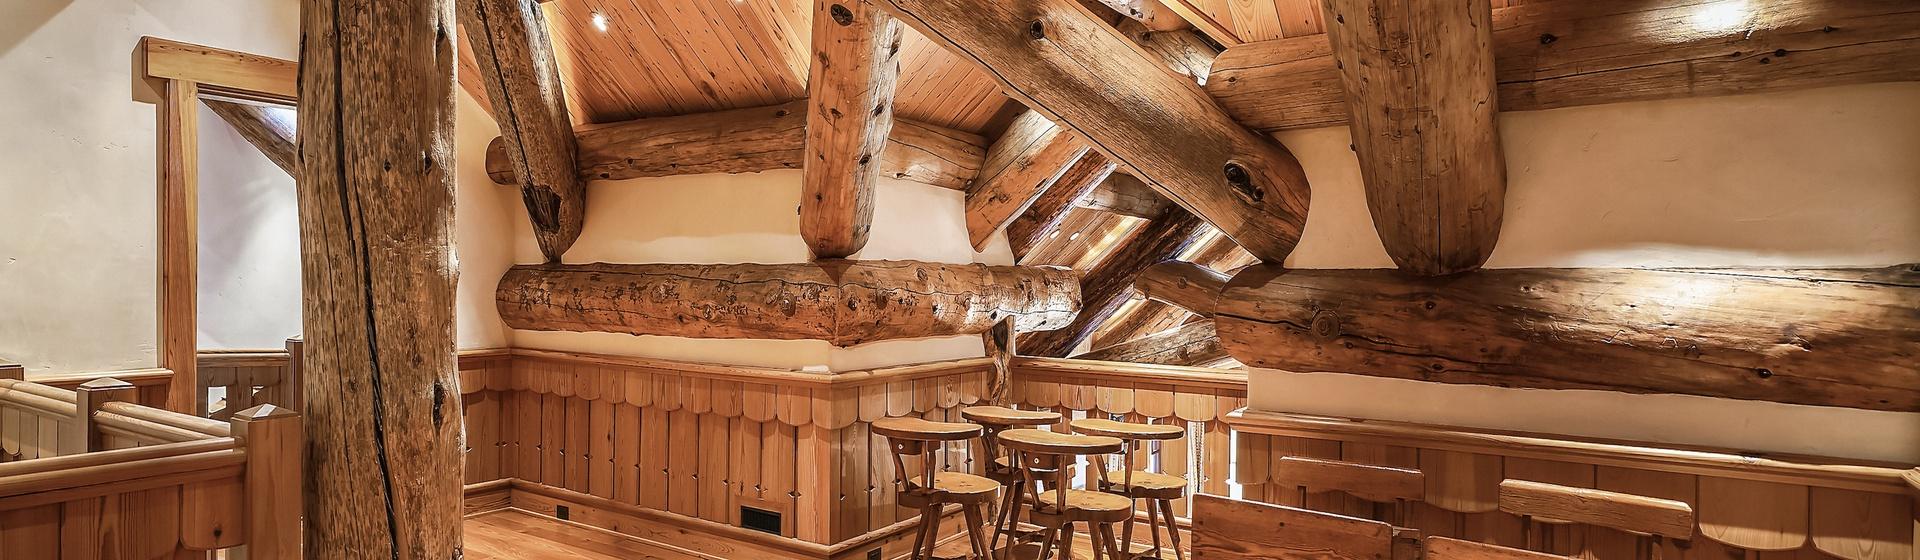 9.11-Telluride-Sleeping-Indian-Ranch-Swiss-Suite-Loft-Sitting-Area-web.JPG